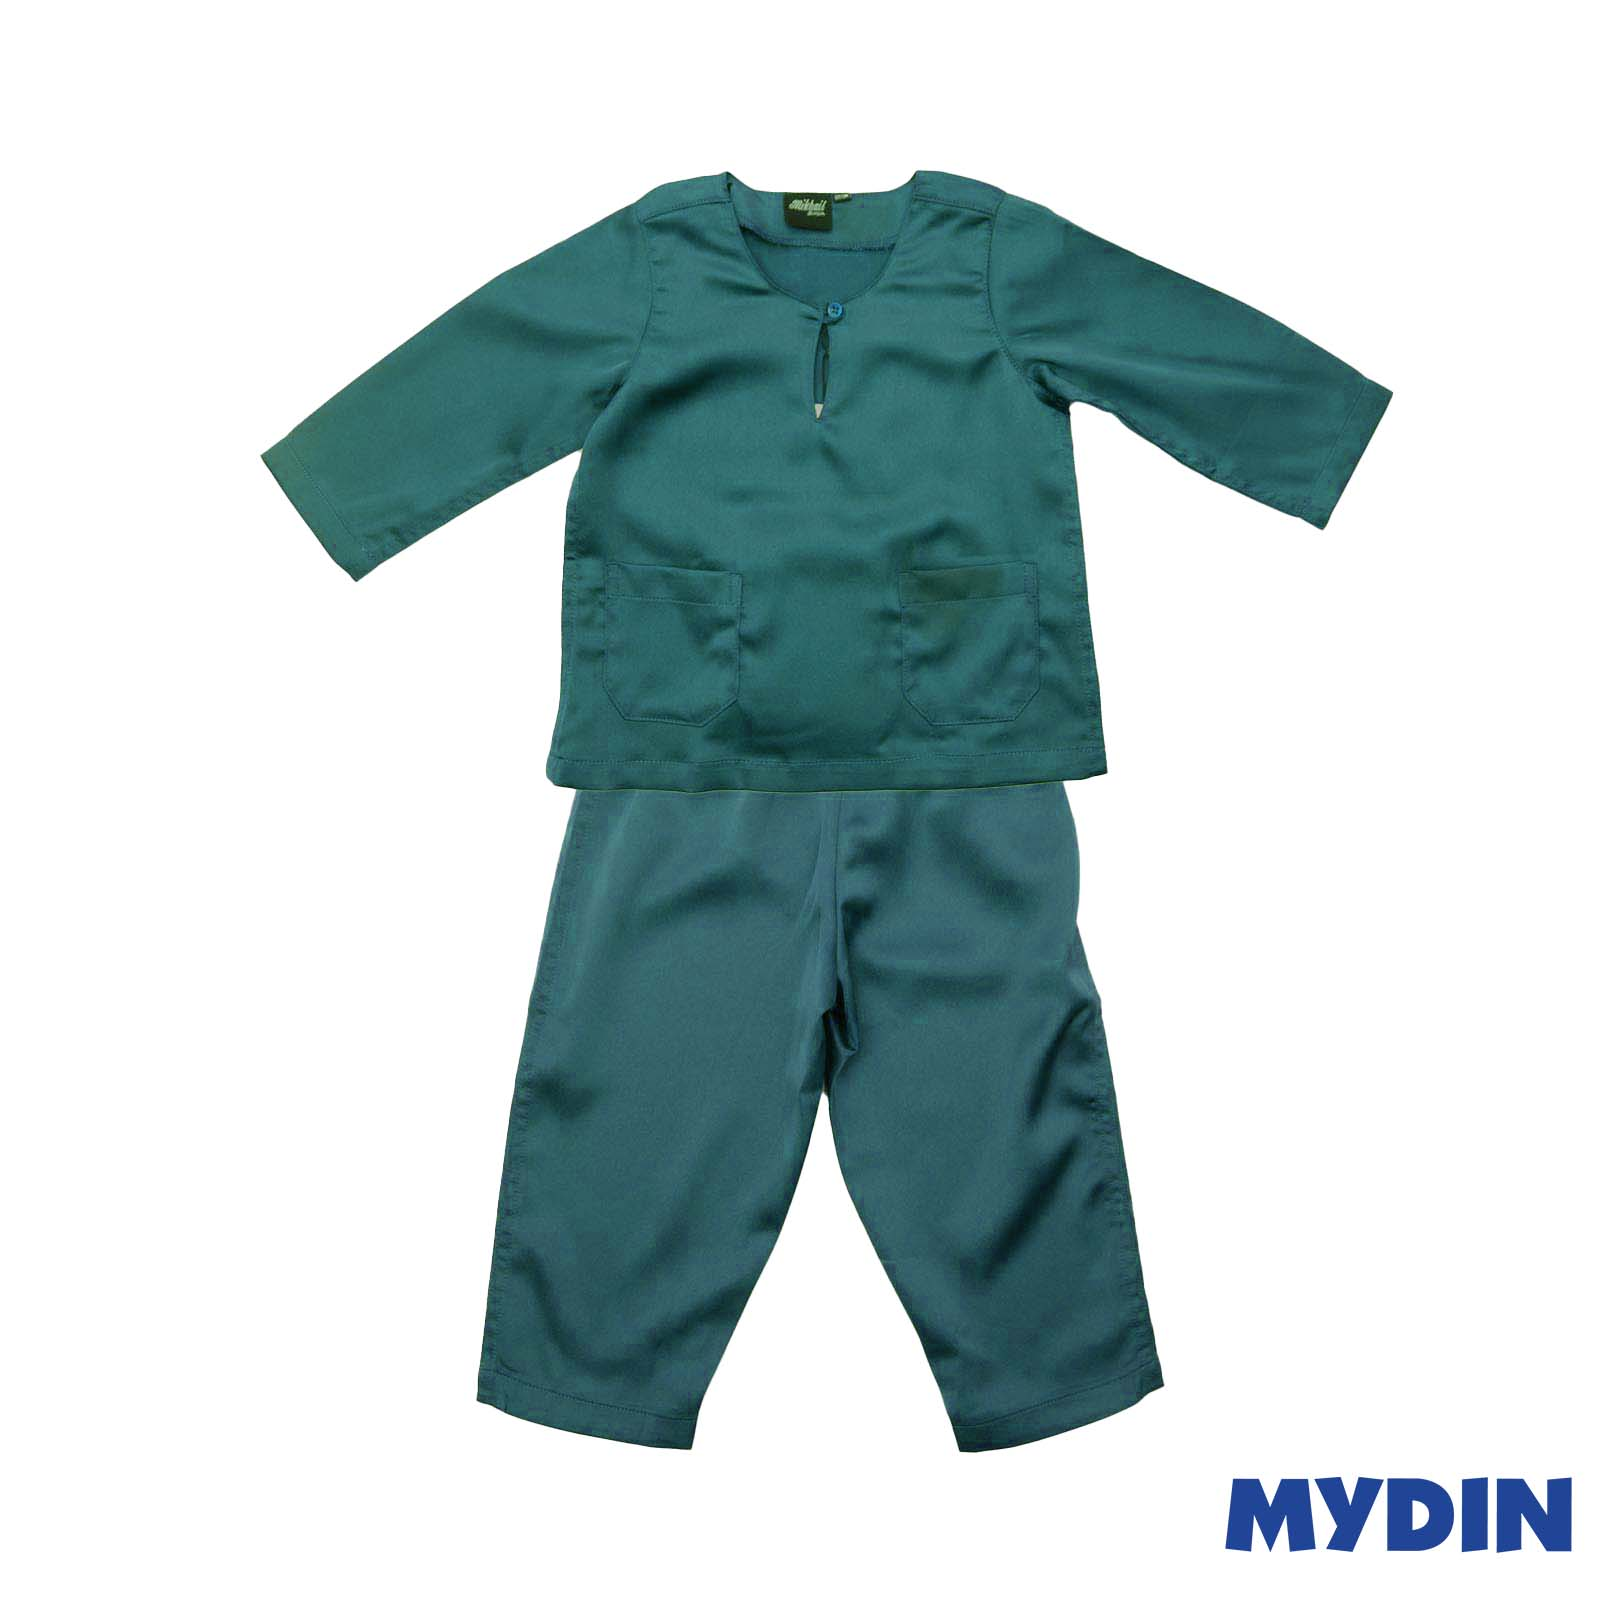 Mikhail Junior Baju Melayu Metalic Sateen Teluk Belanga (Size 6-12) 0819BCW Turquoise